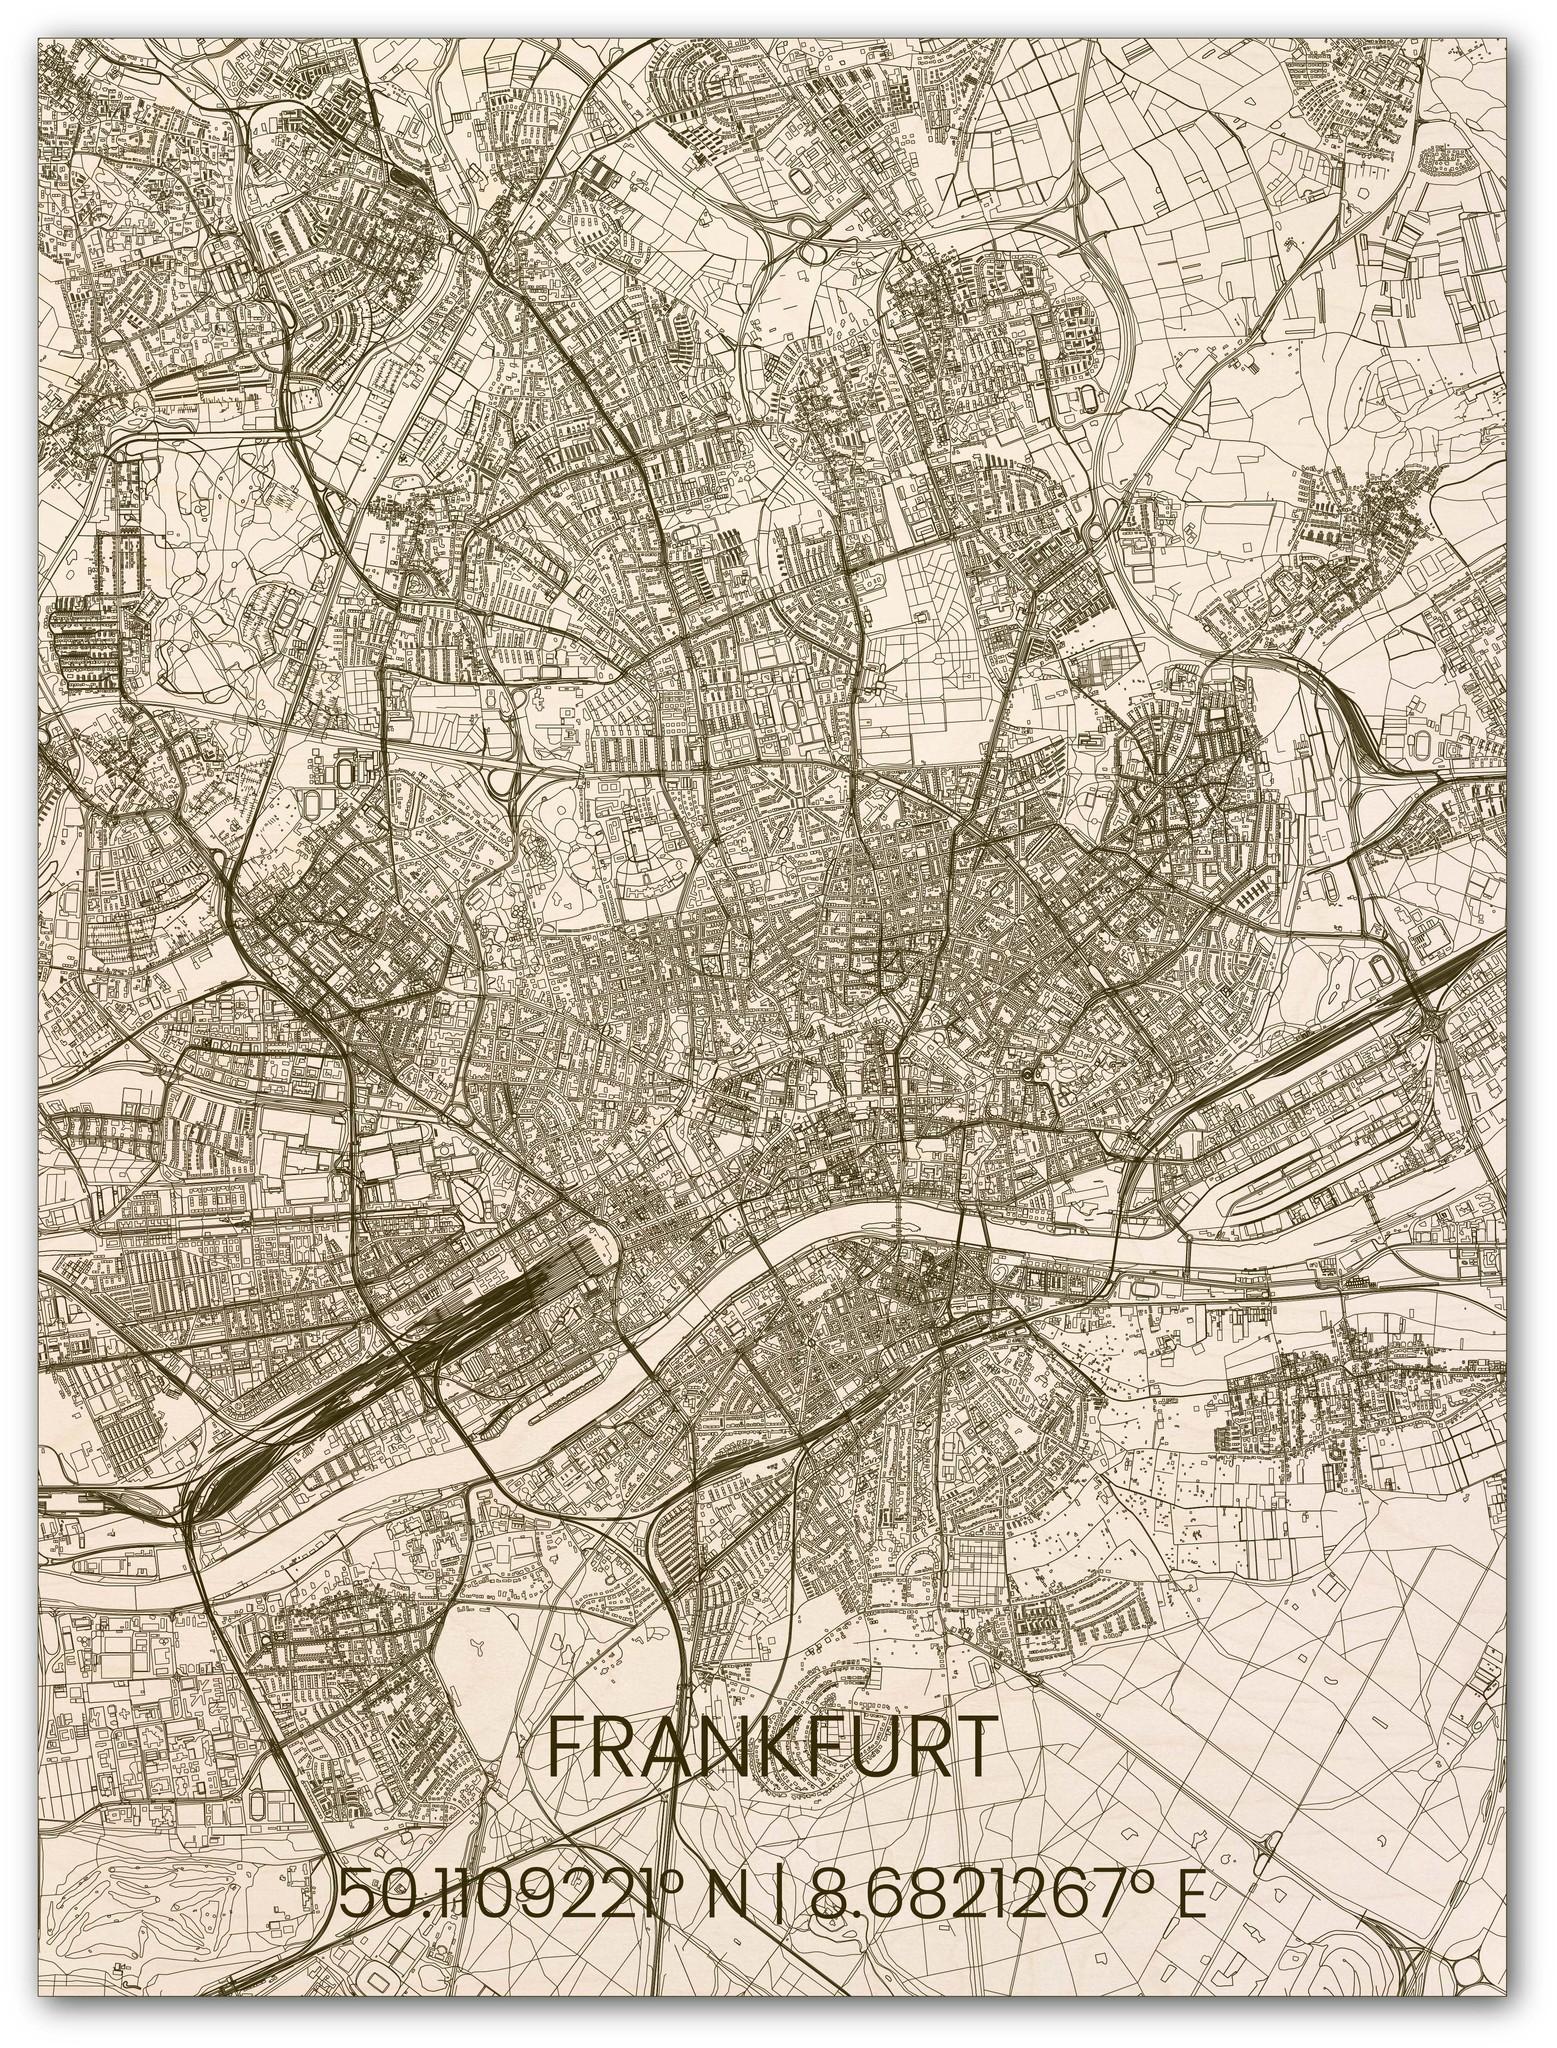 Houten stadsplattegrond Frankfurt-1